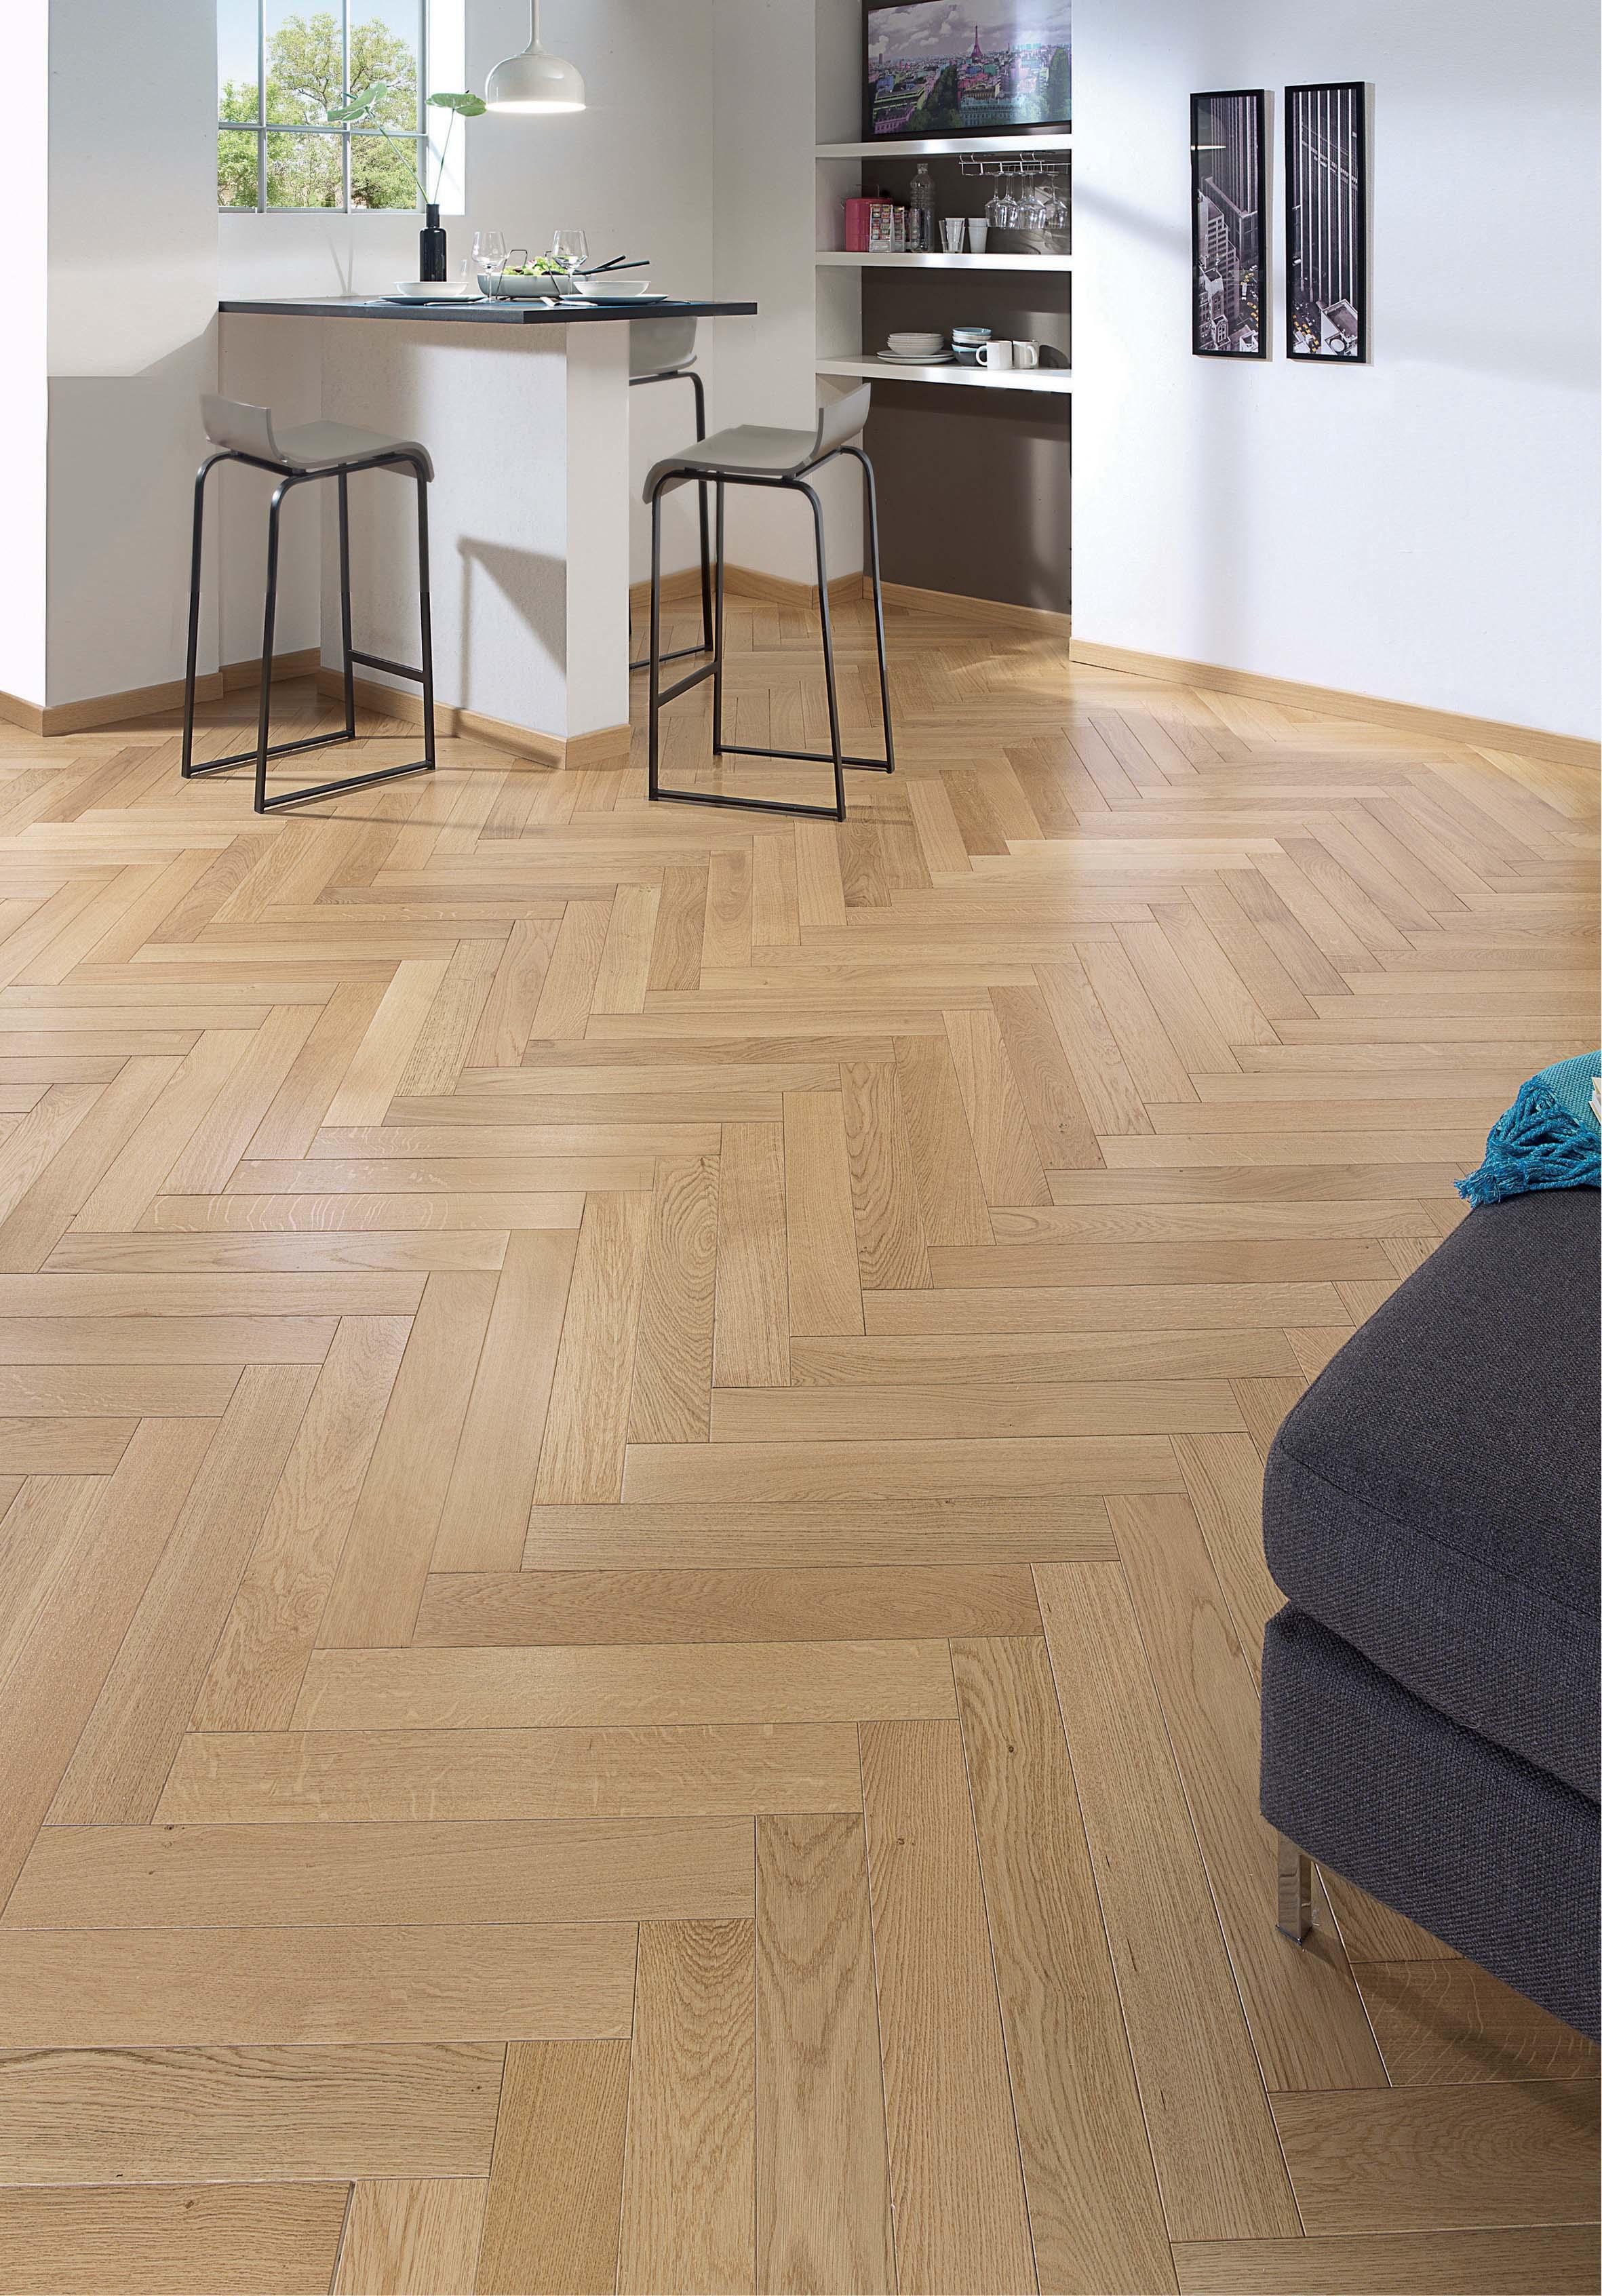 parquet ch ne mix classic authentique satin b ton rompu 90 parquet contrecoll. Black Bedroom Furniture Sets. Home Design Ideas